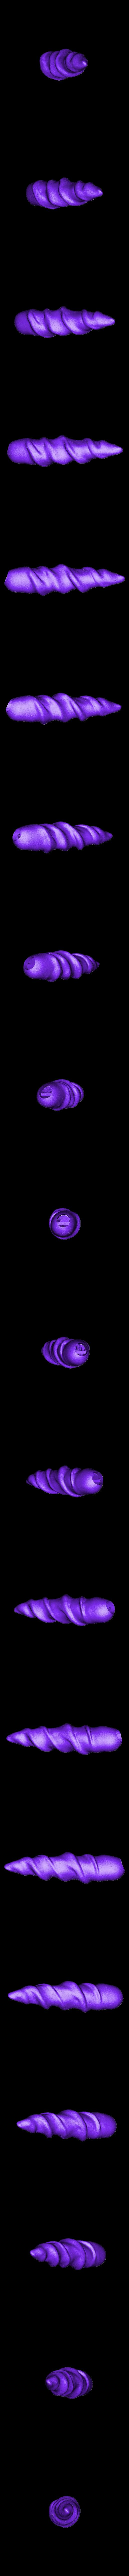 Unicorn_Horn.stl Download free OBJ file Unicorn Night Light • 3D printable design, Pza4Rza